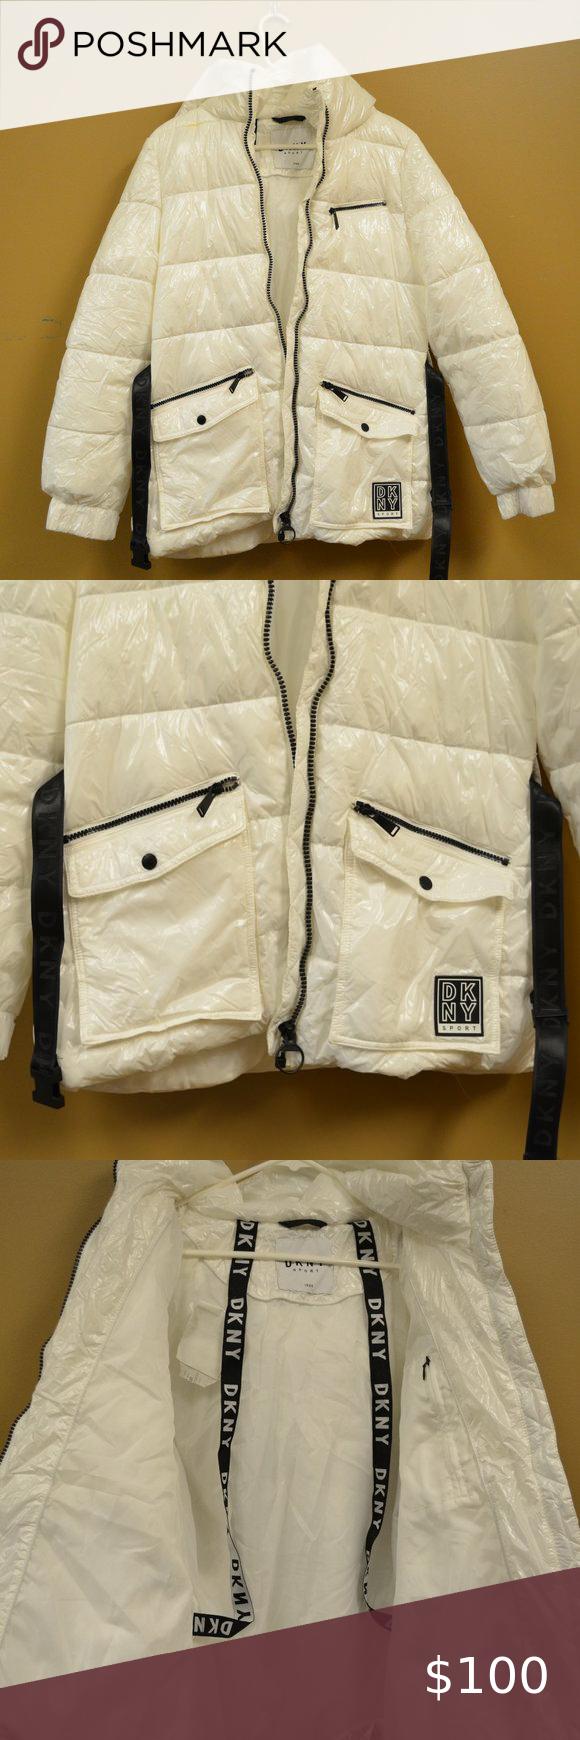 Hp Dkny Belted Hooded Puffer Jacket White Coats Jackets Women Yellow Long Sleeve Shirt Women S Puffer Coats [ 1740 x 580 Pixel ]